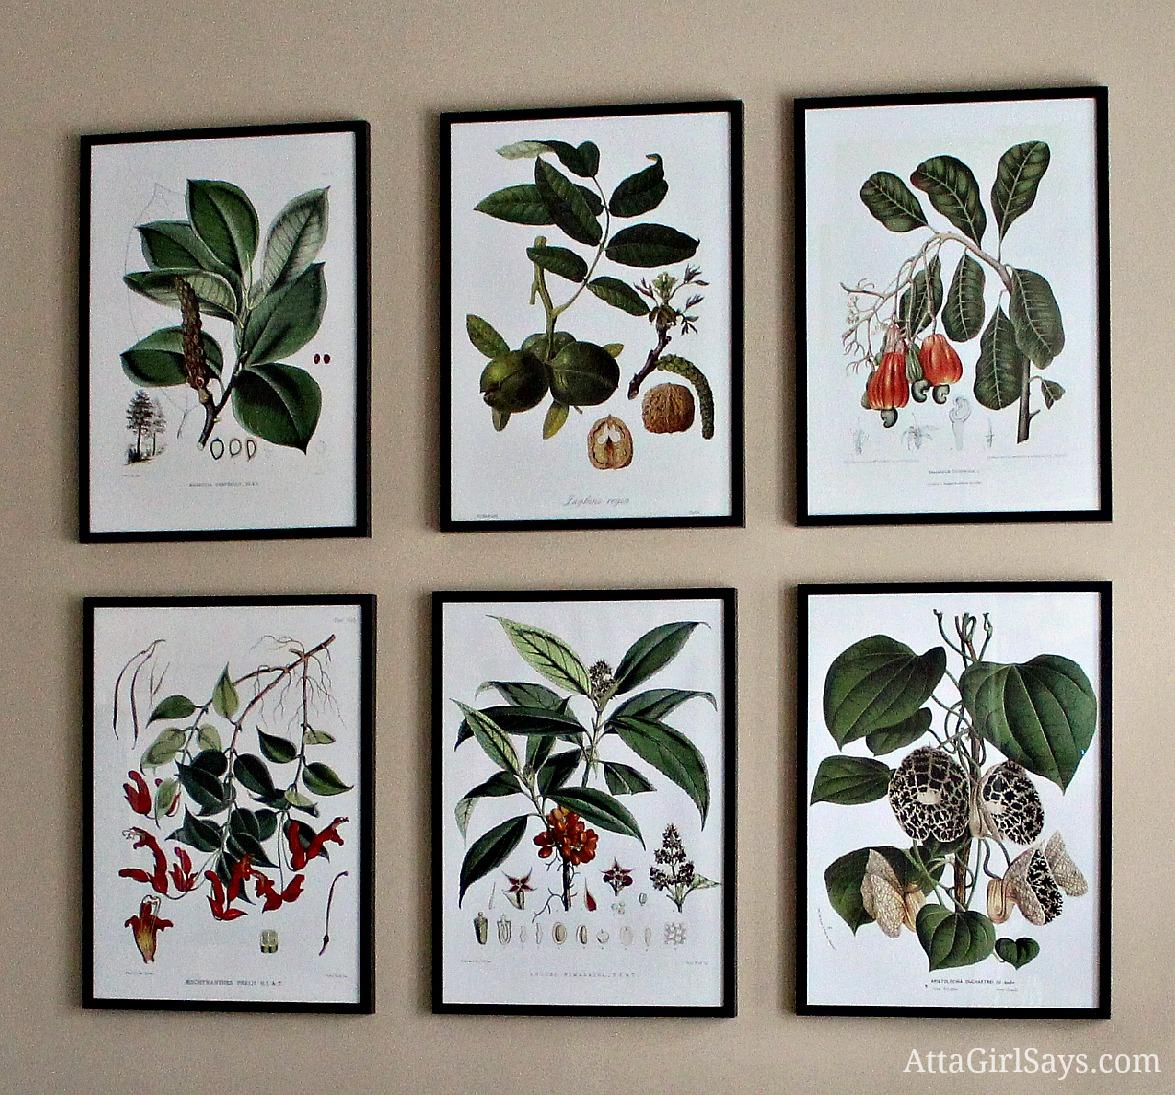 Inexpensive Botanical Art Grouping